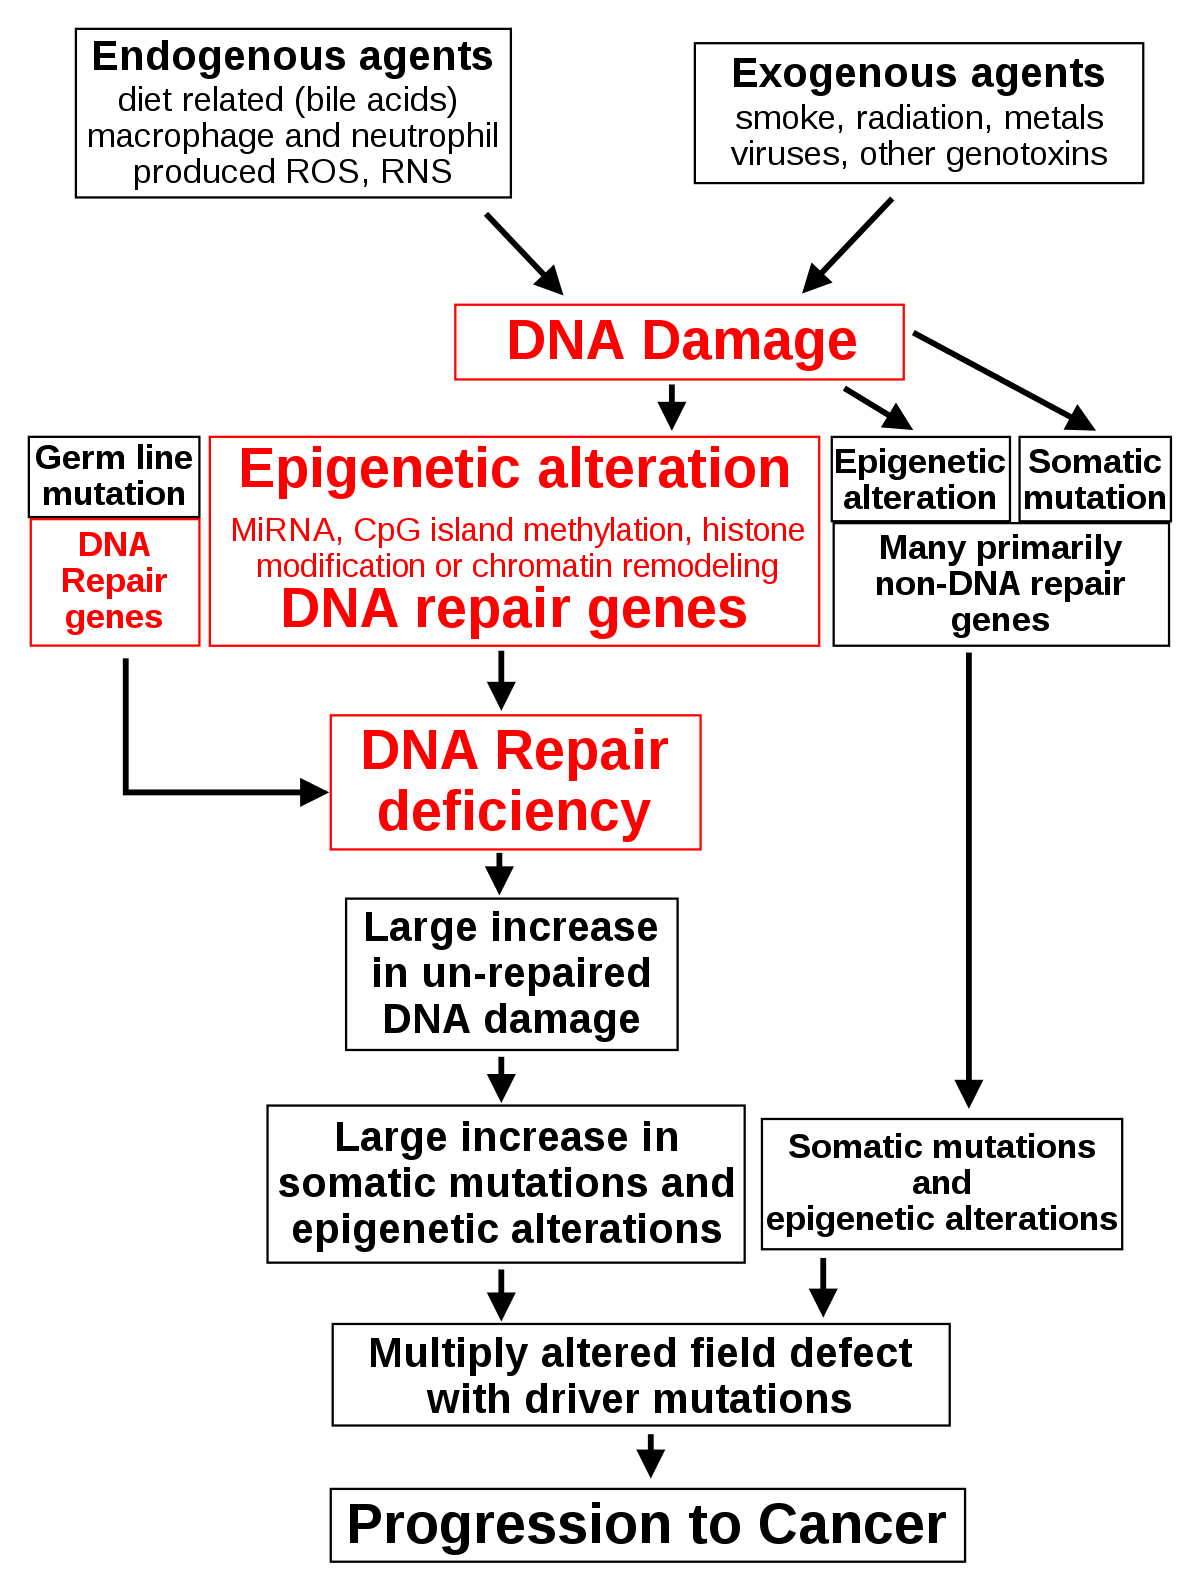 Diphildobothriasis invazív stádiuma, A féregkezelés tünetei